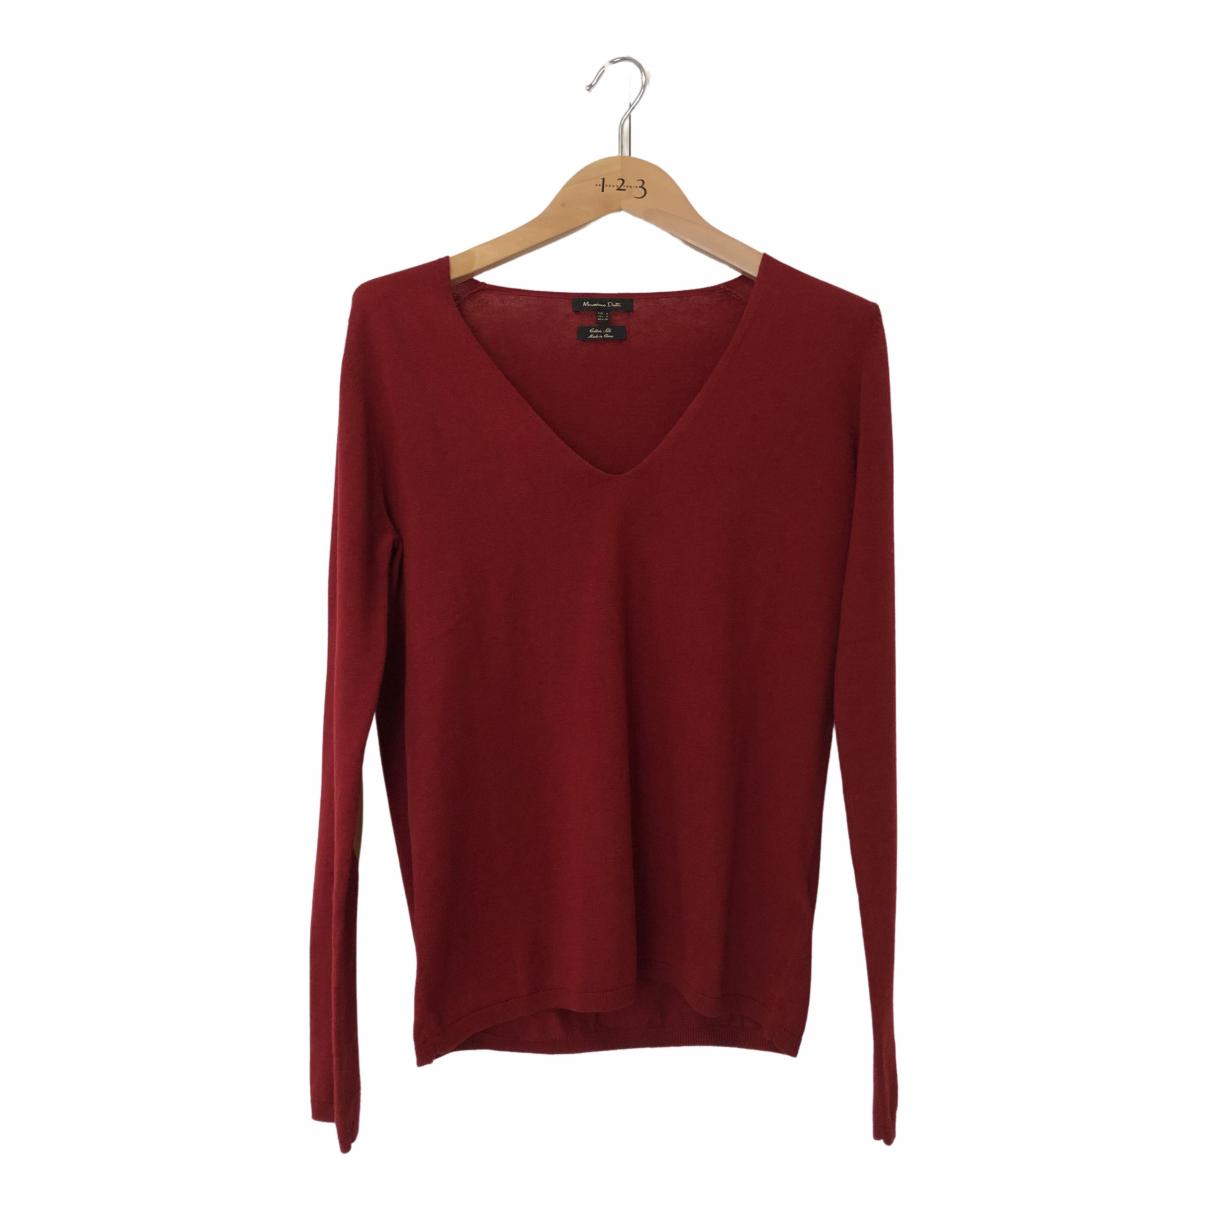 Massimo Dutti \N Burgundy Cotton Knitwear for Women S International